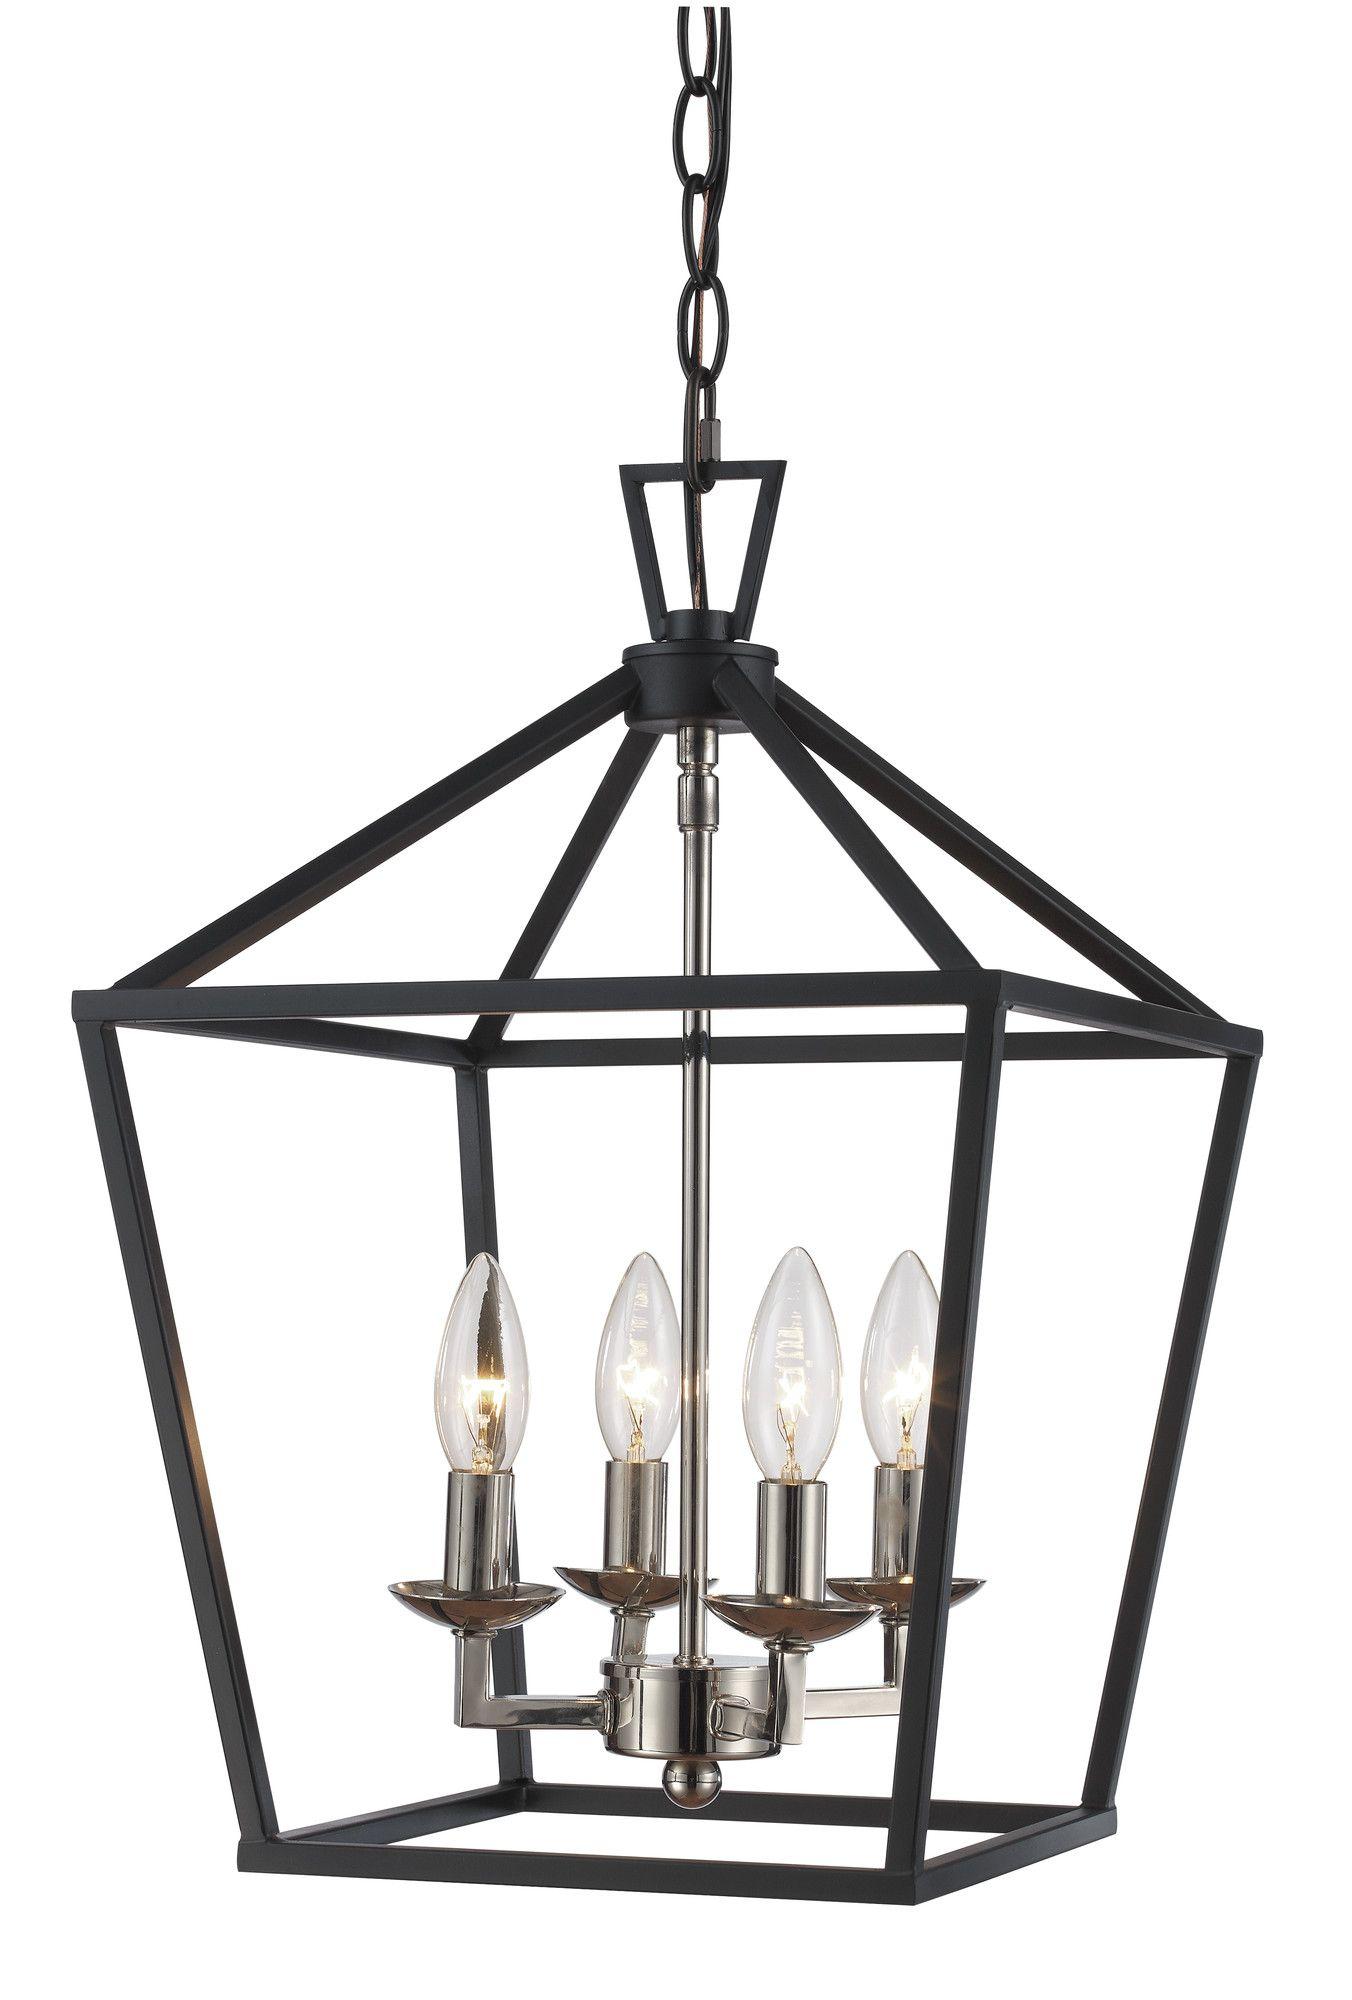 Carmen light pendant black matte light fixtures pinterest